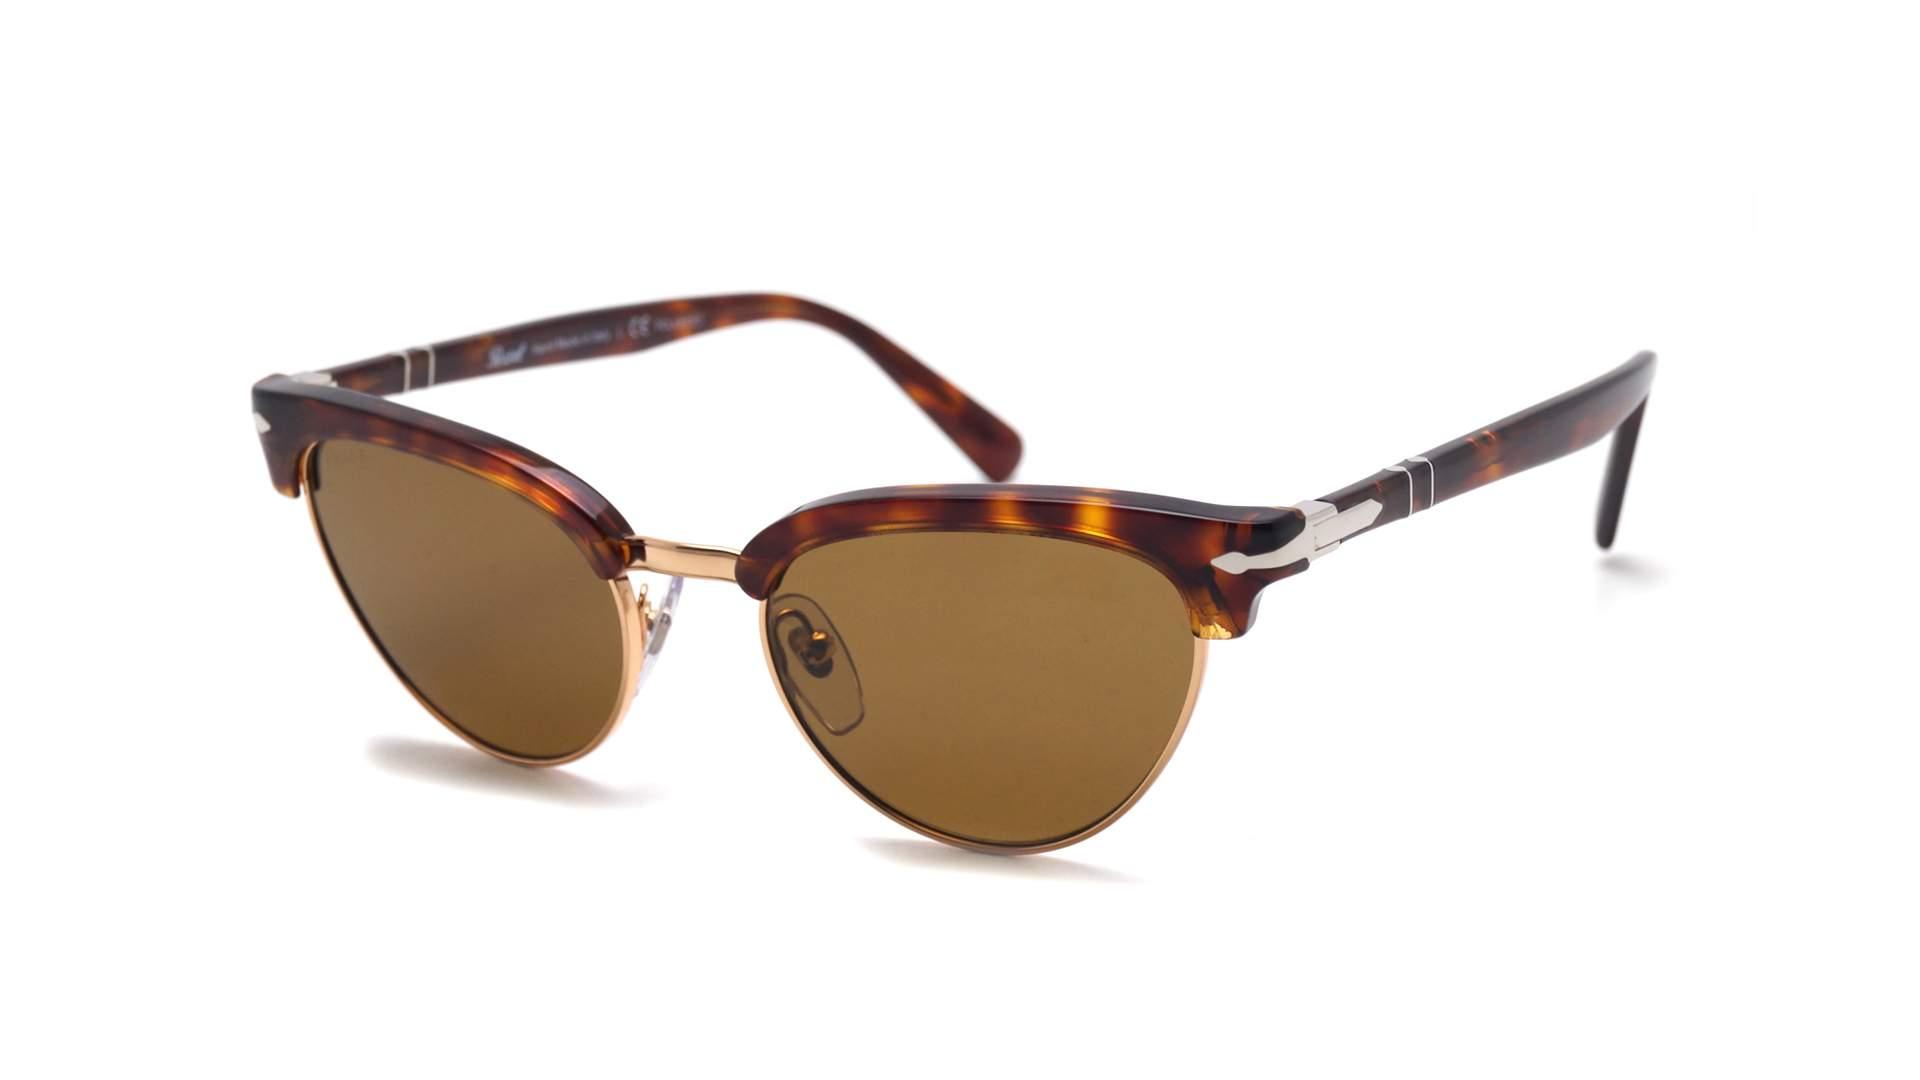 bae8591961 Sunglasses Persol Tailoring edition Havana Tortoise PO3198S 24 57 51-19  Medium Polarized